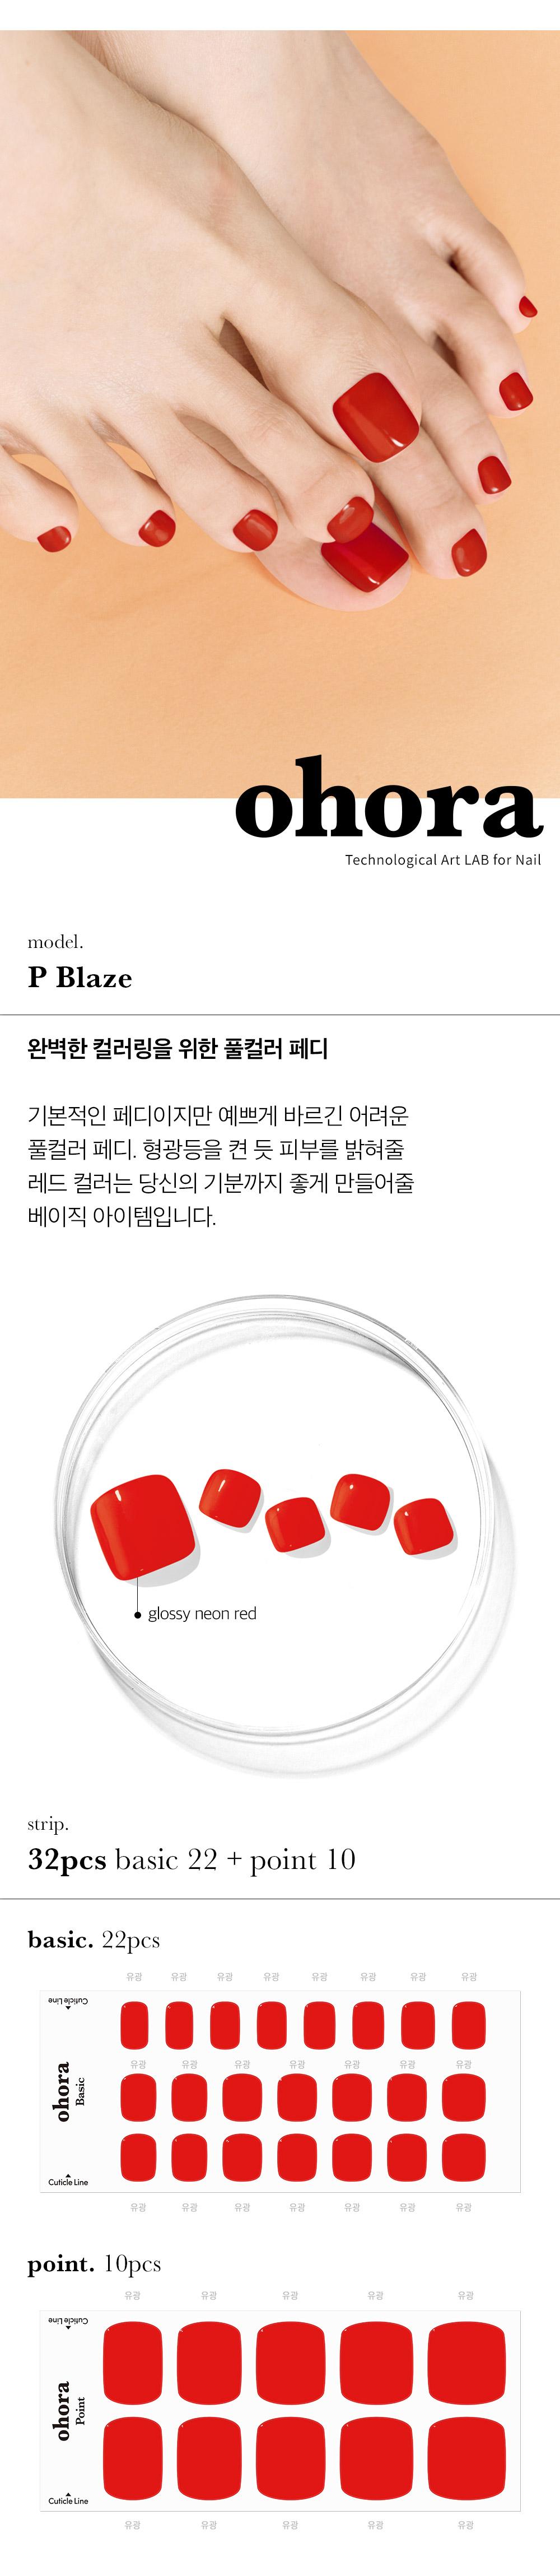 [ShiPAPA] ohora   凝膠甲貼   韓國直送🇰🇷   香港 澳門